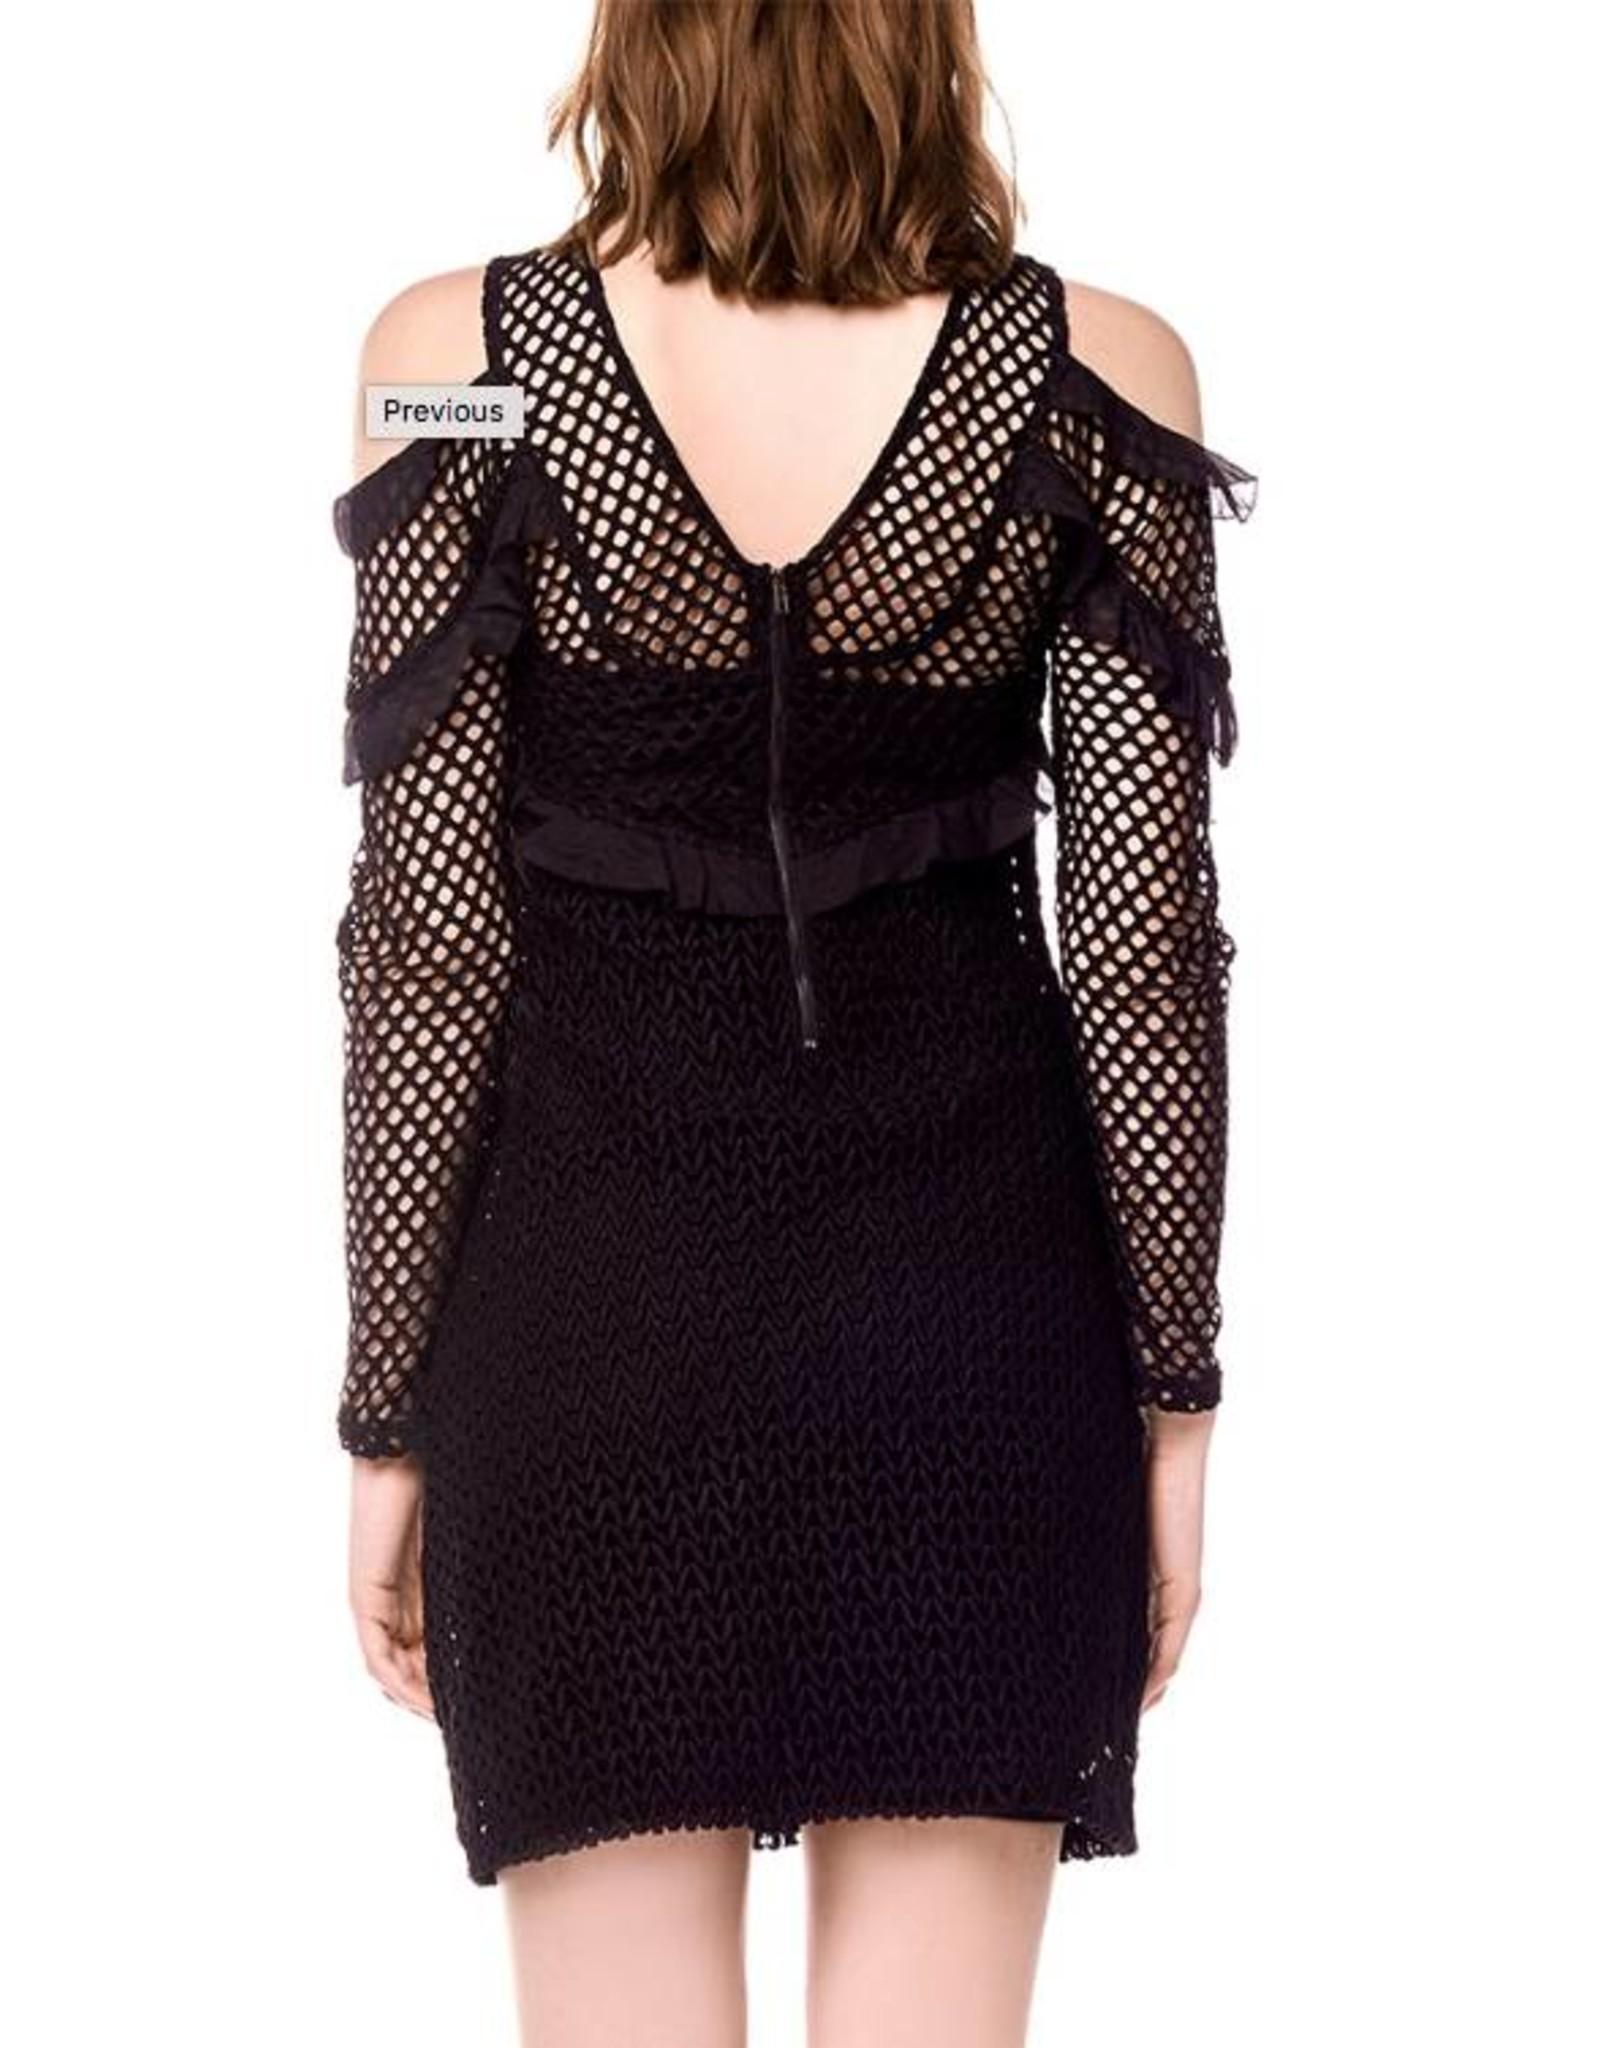 Jordan Dress Black